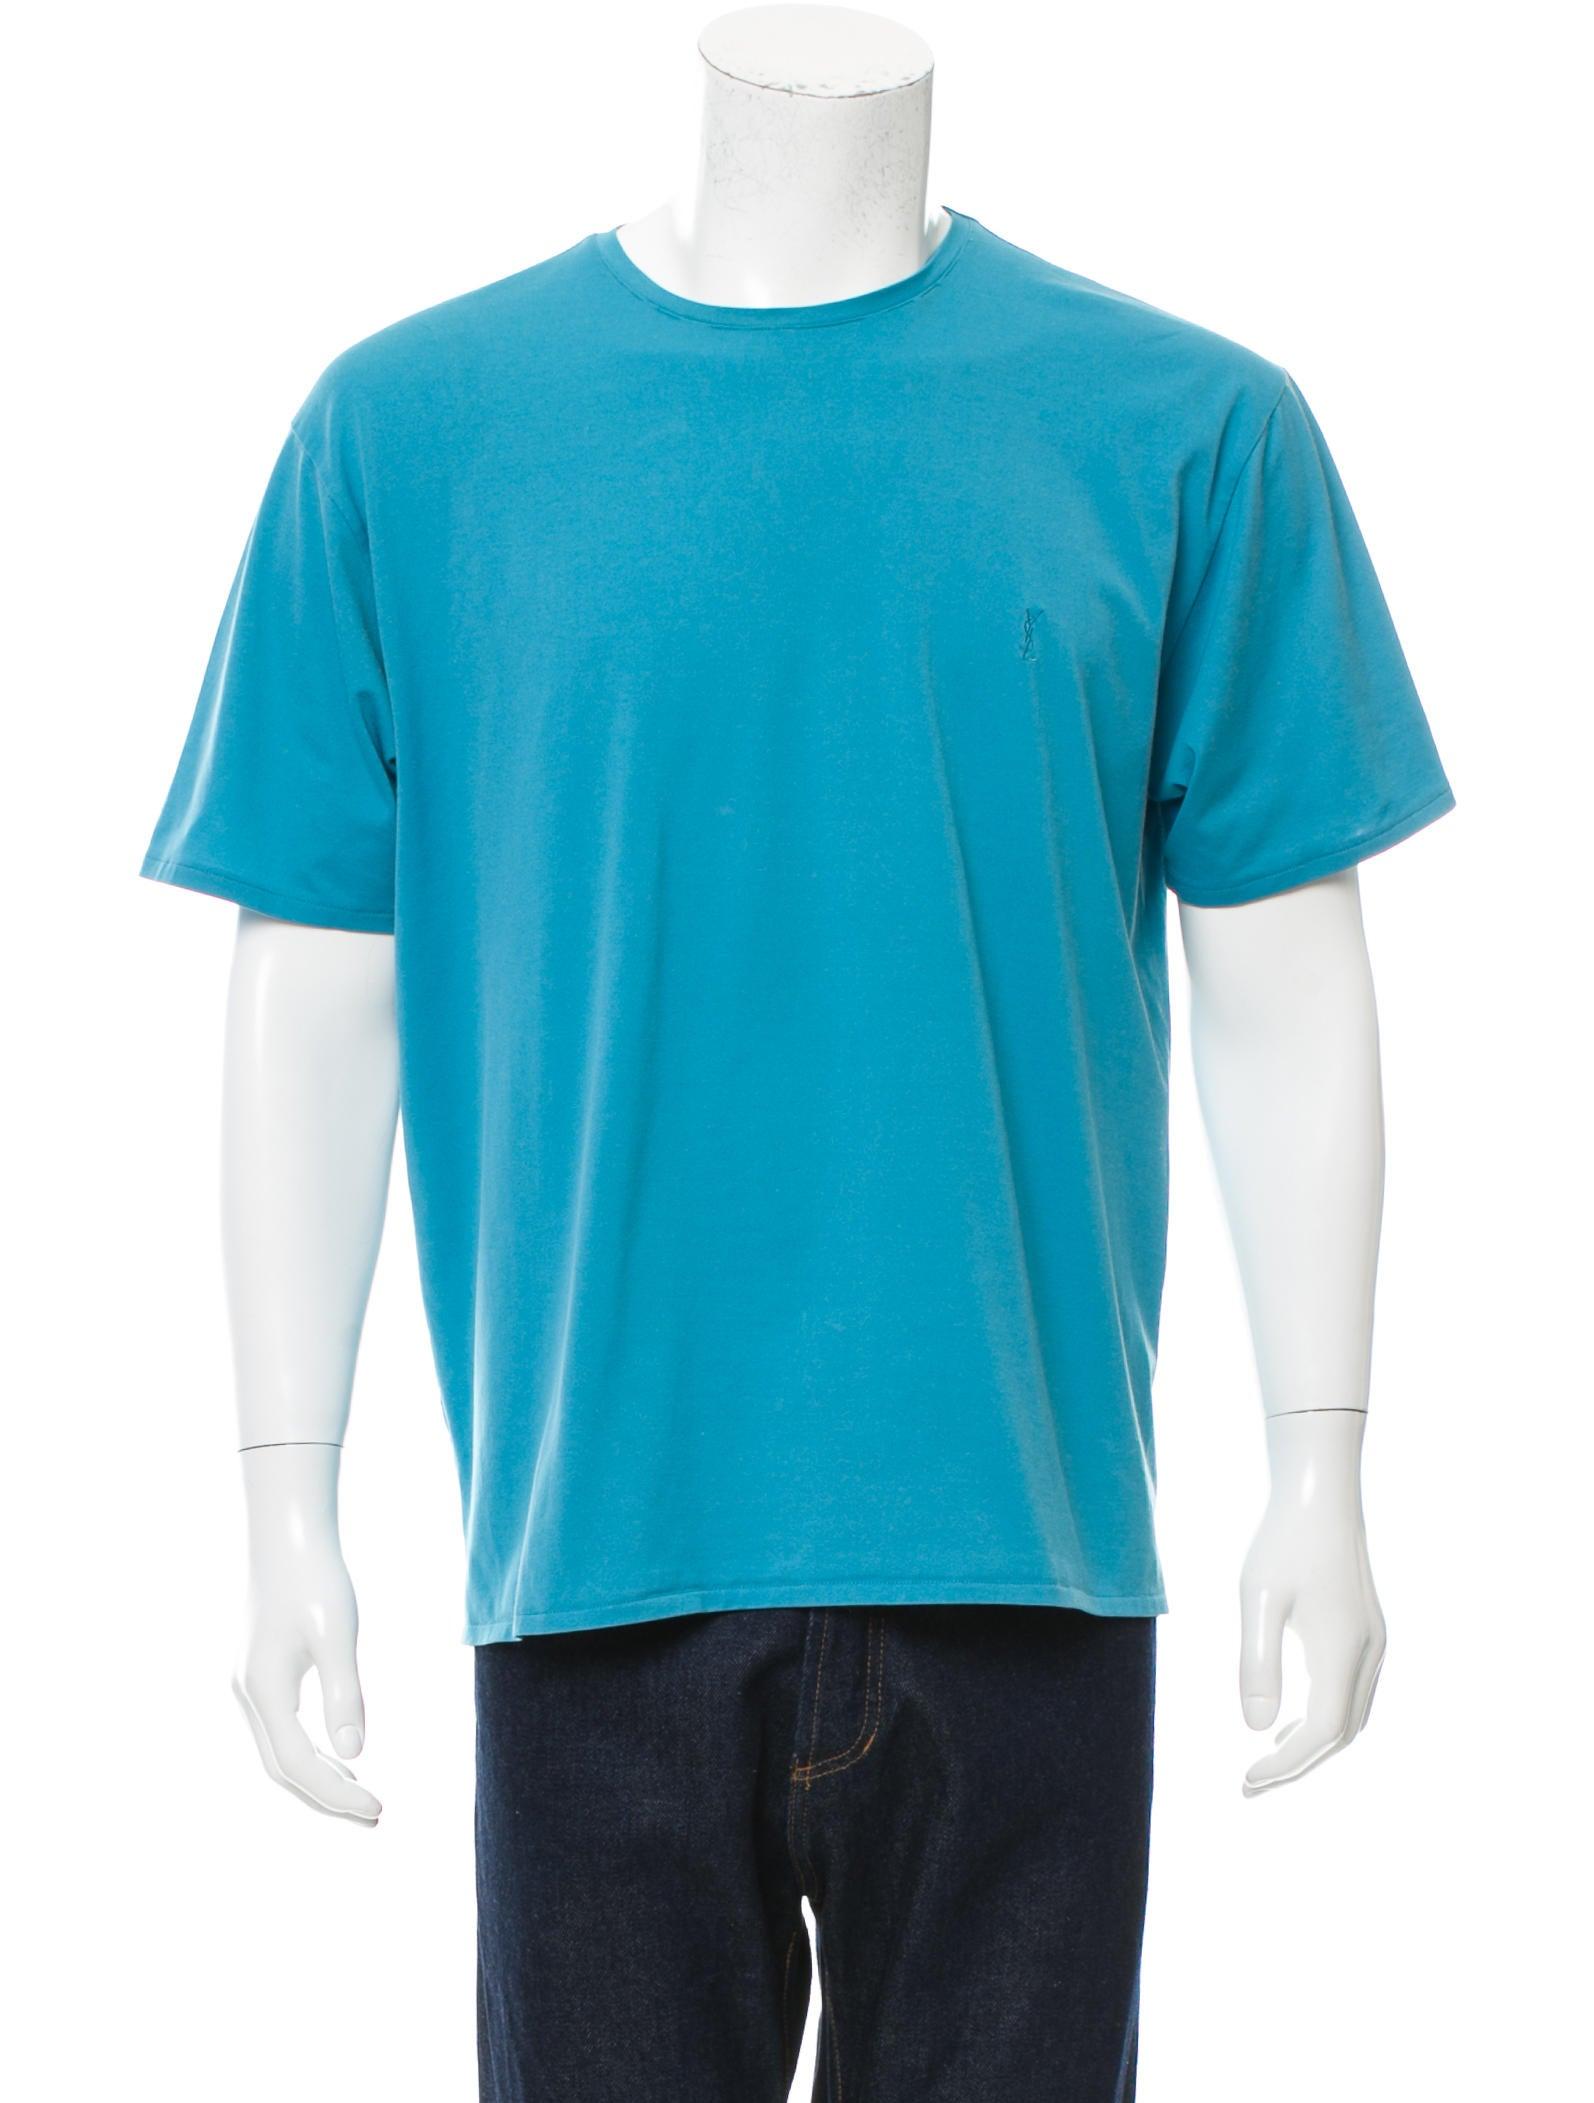 Yves saint laurent logo embroidered crew neck t shirt for Ysl logo tee shirt